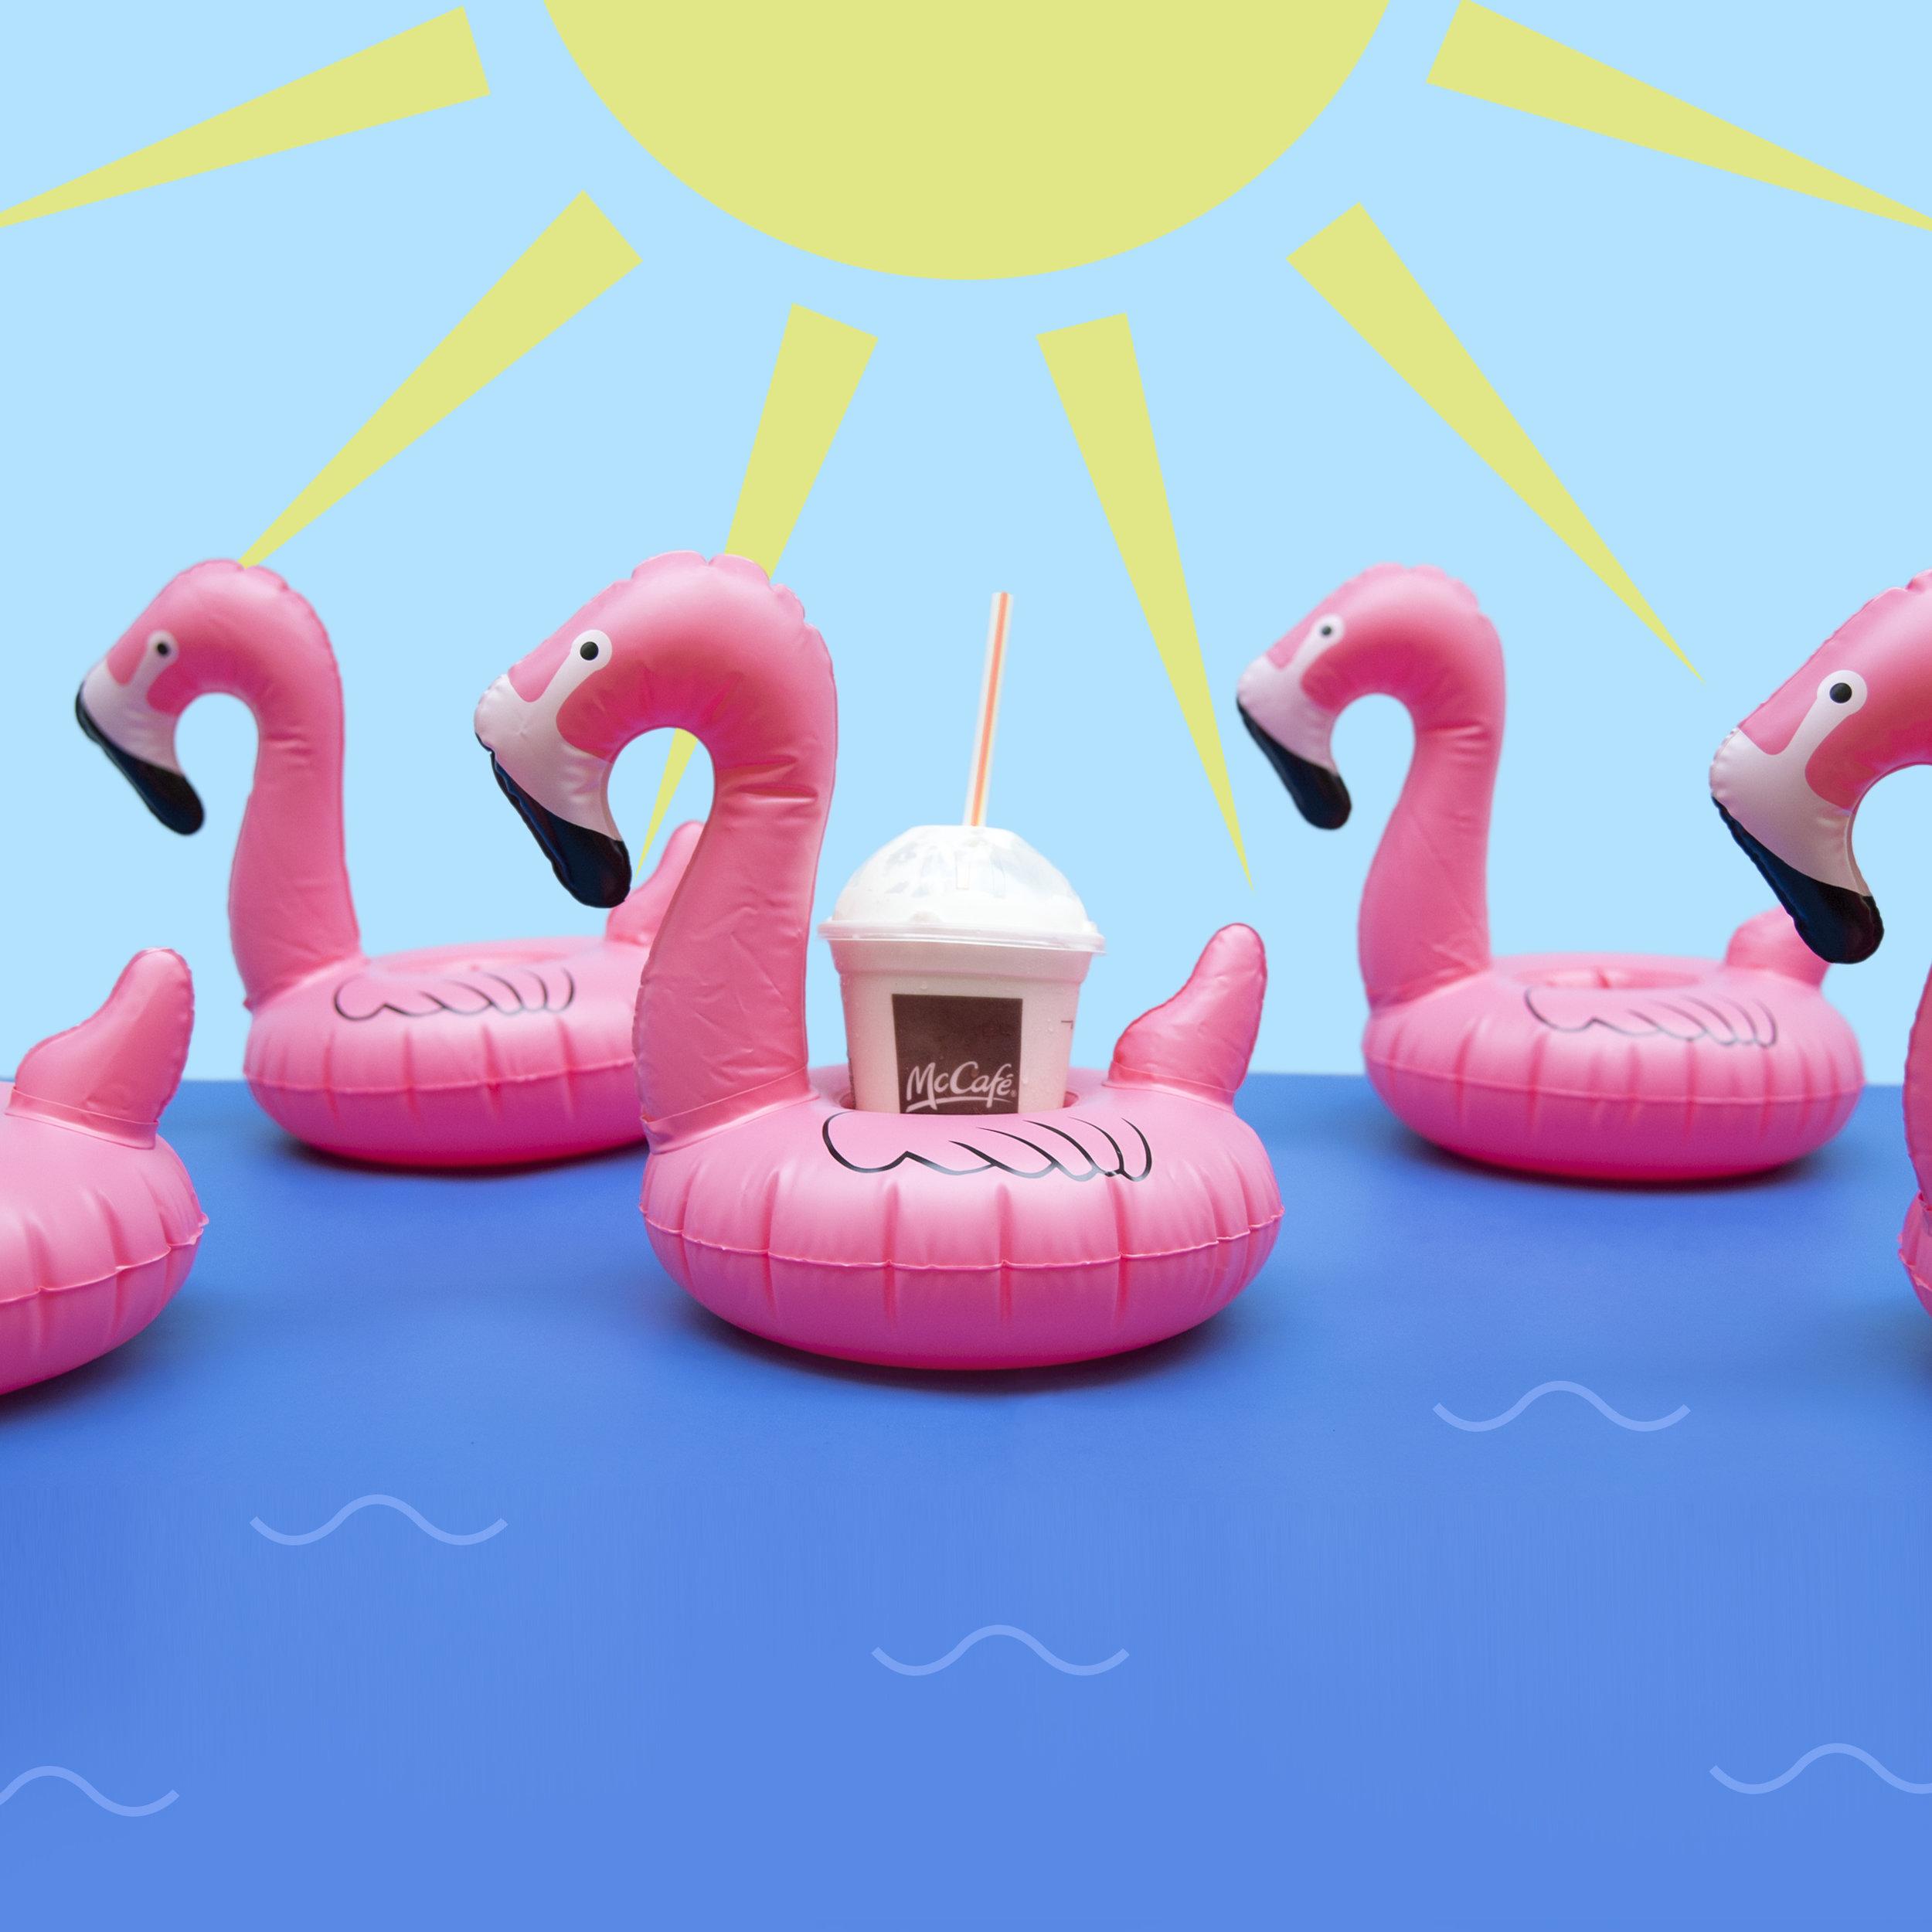 amy_chen_design_mcdonalds_mcflurry_drink_summer_flamingos_pool_float_sun_advertising_ad